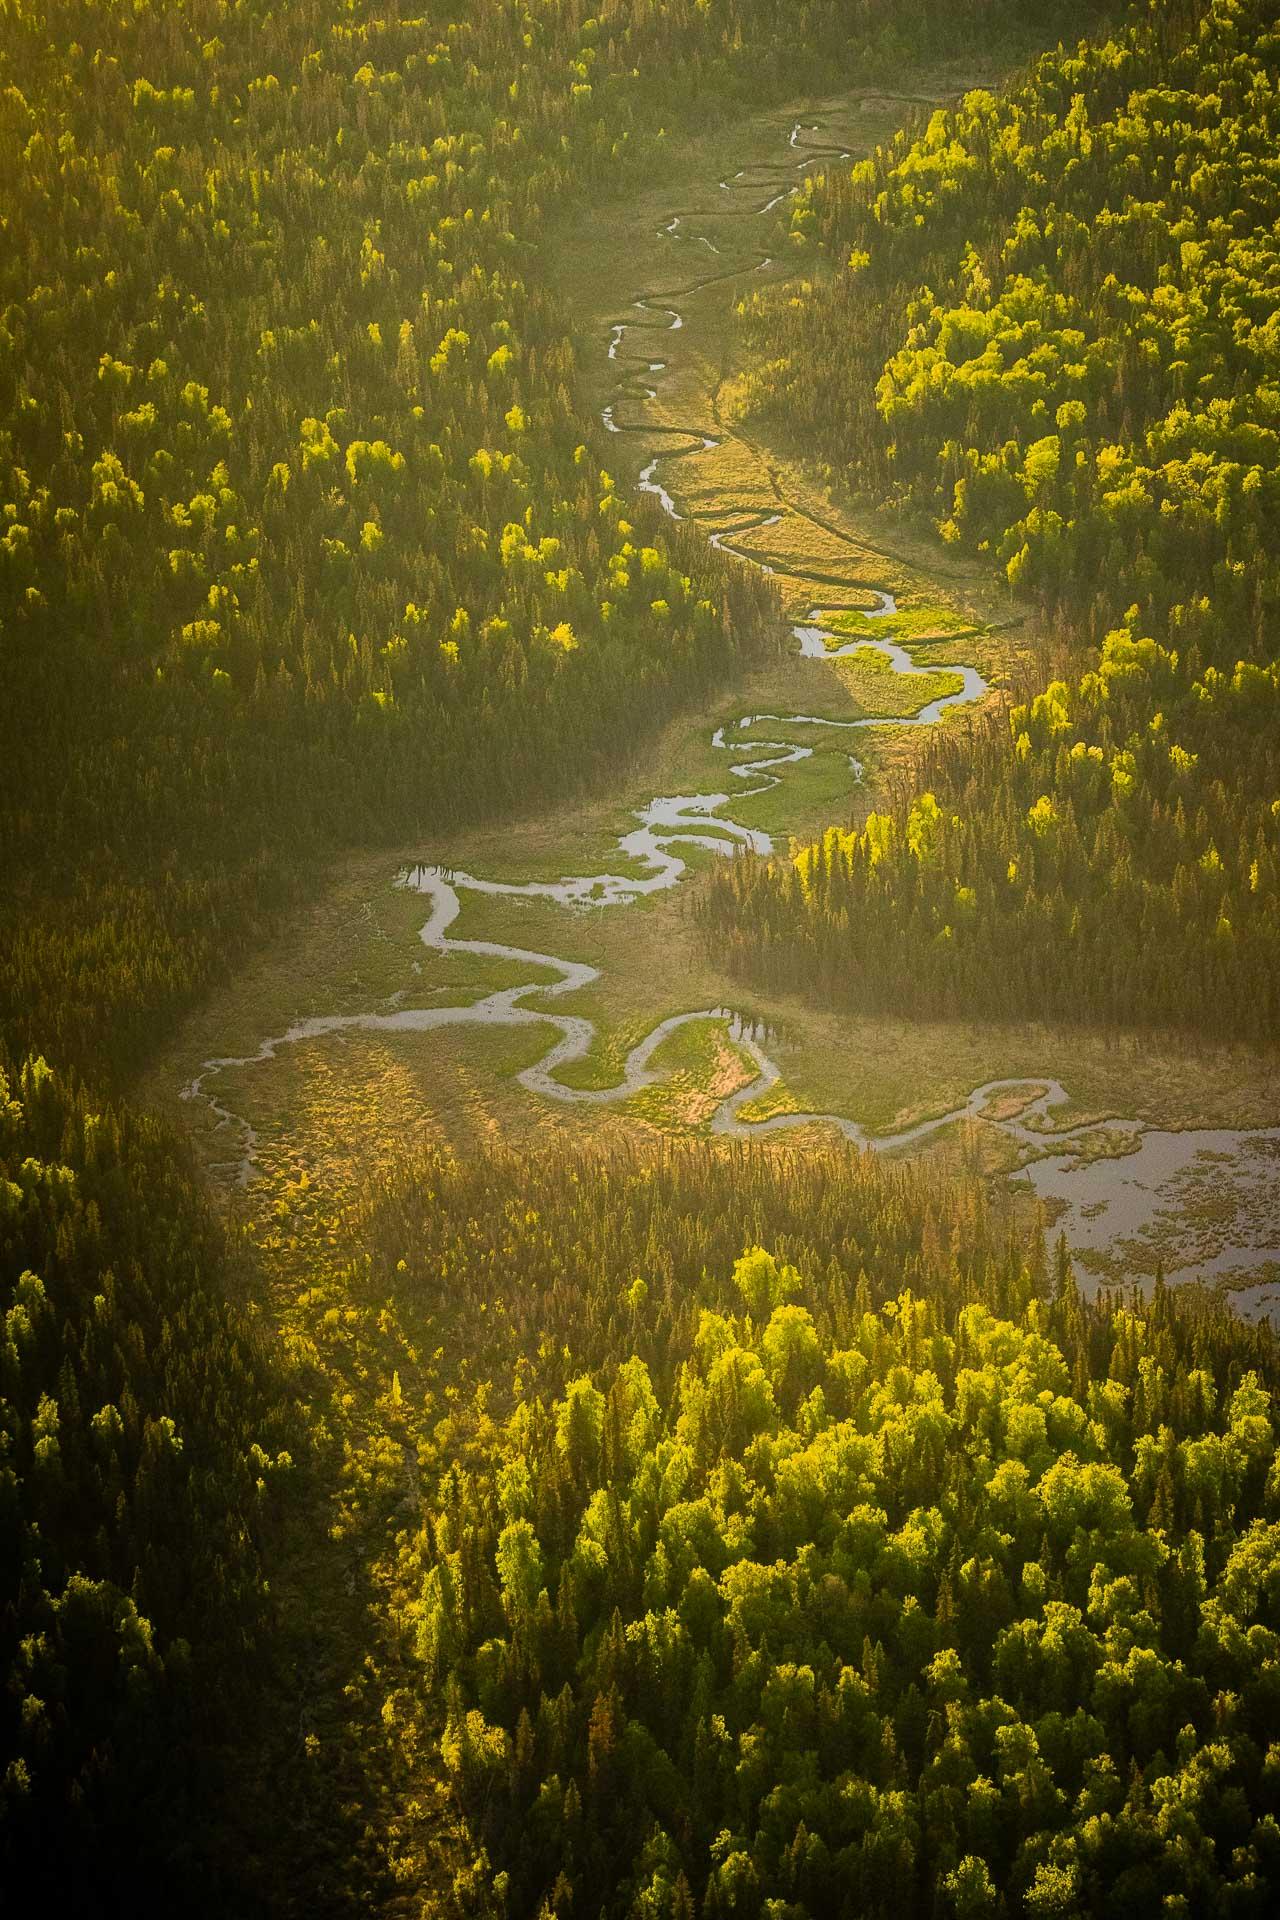 Kenali Alaksa Rivers